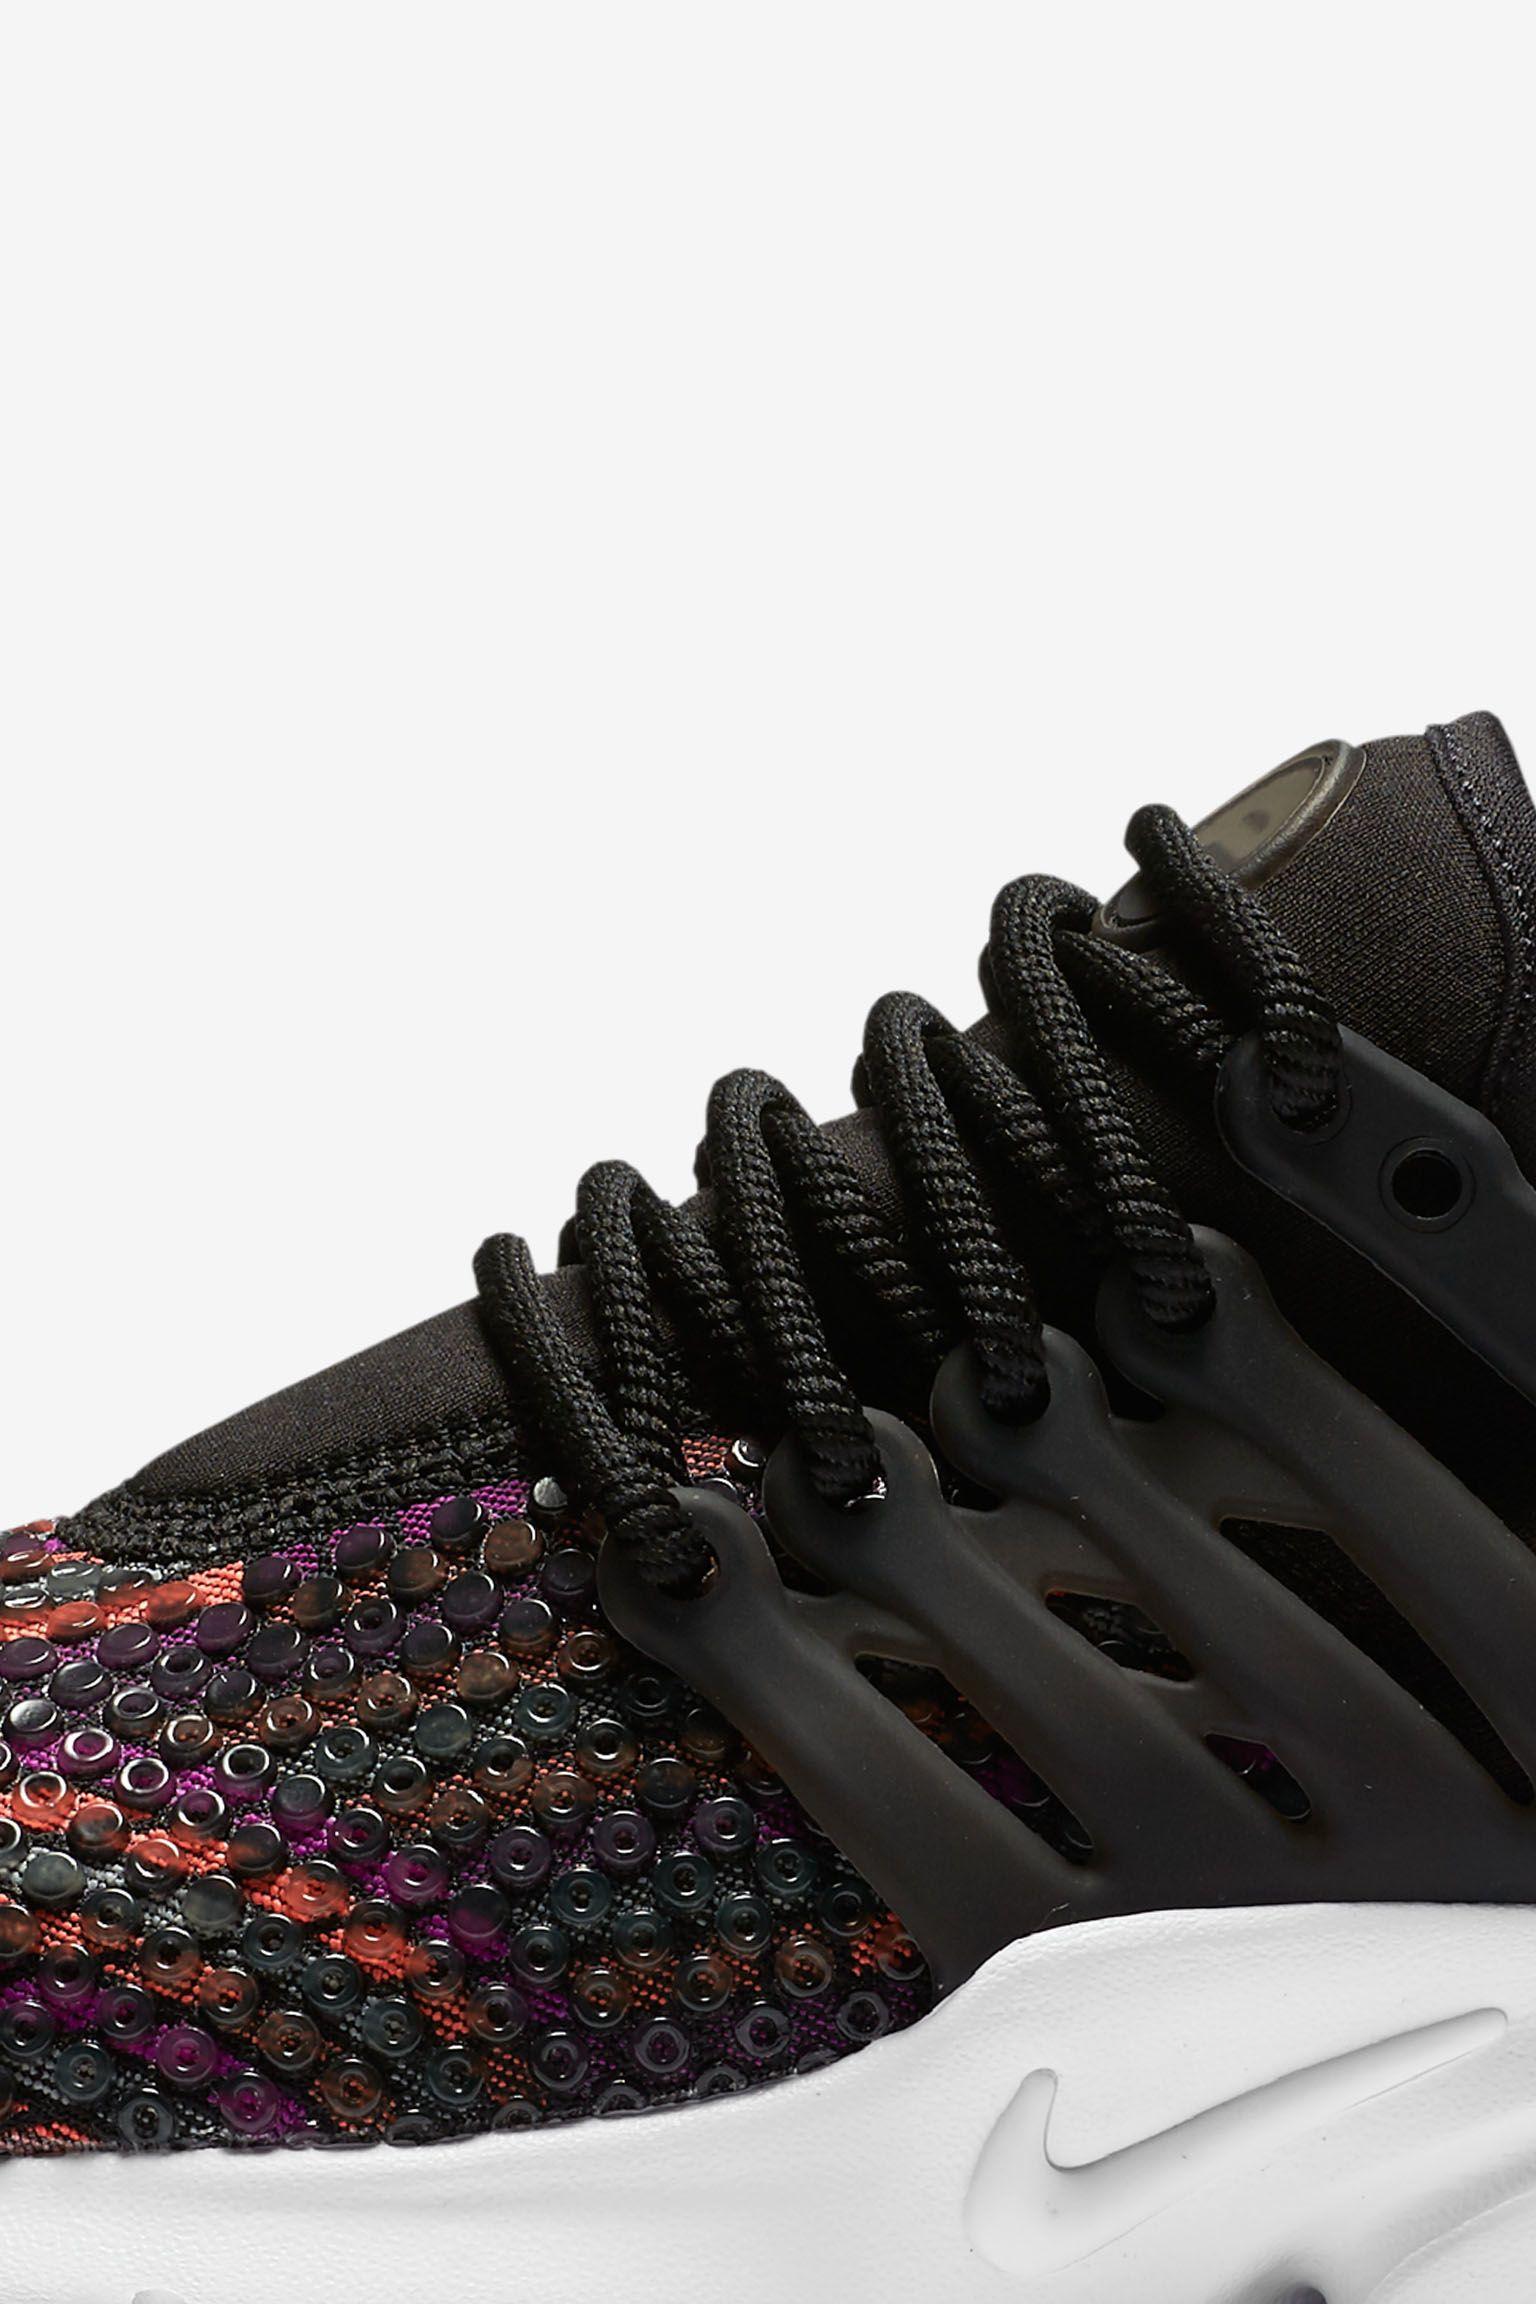 Women's Nike Air Presto Jacquard Premium 'Hot Lava'